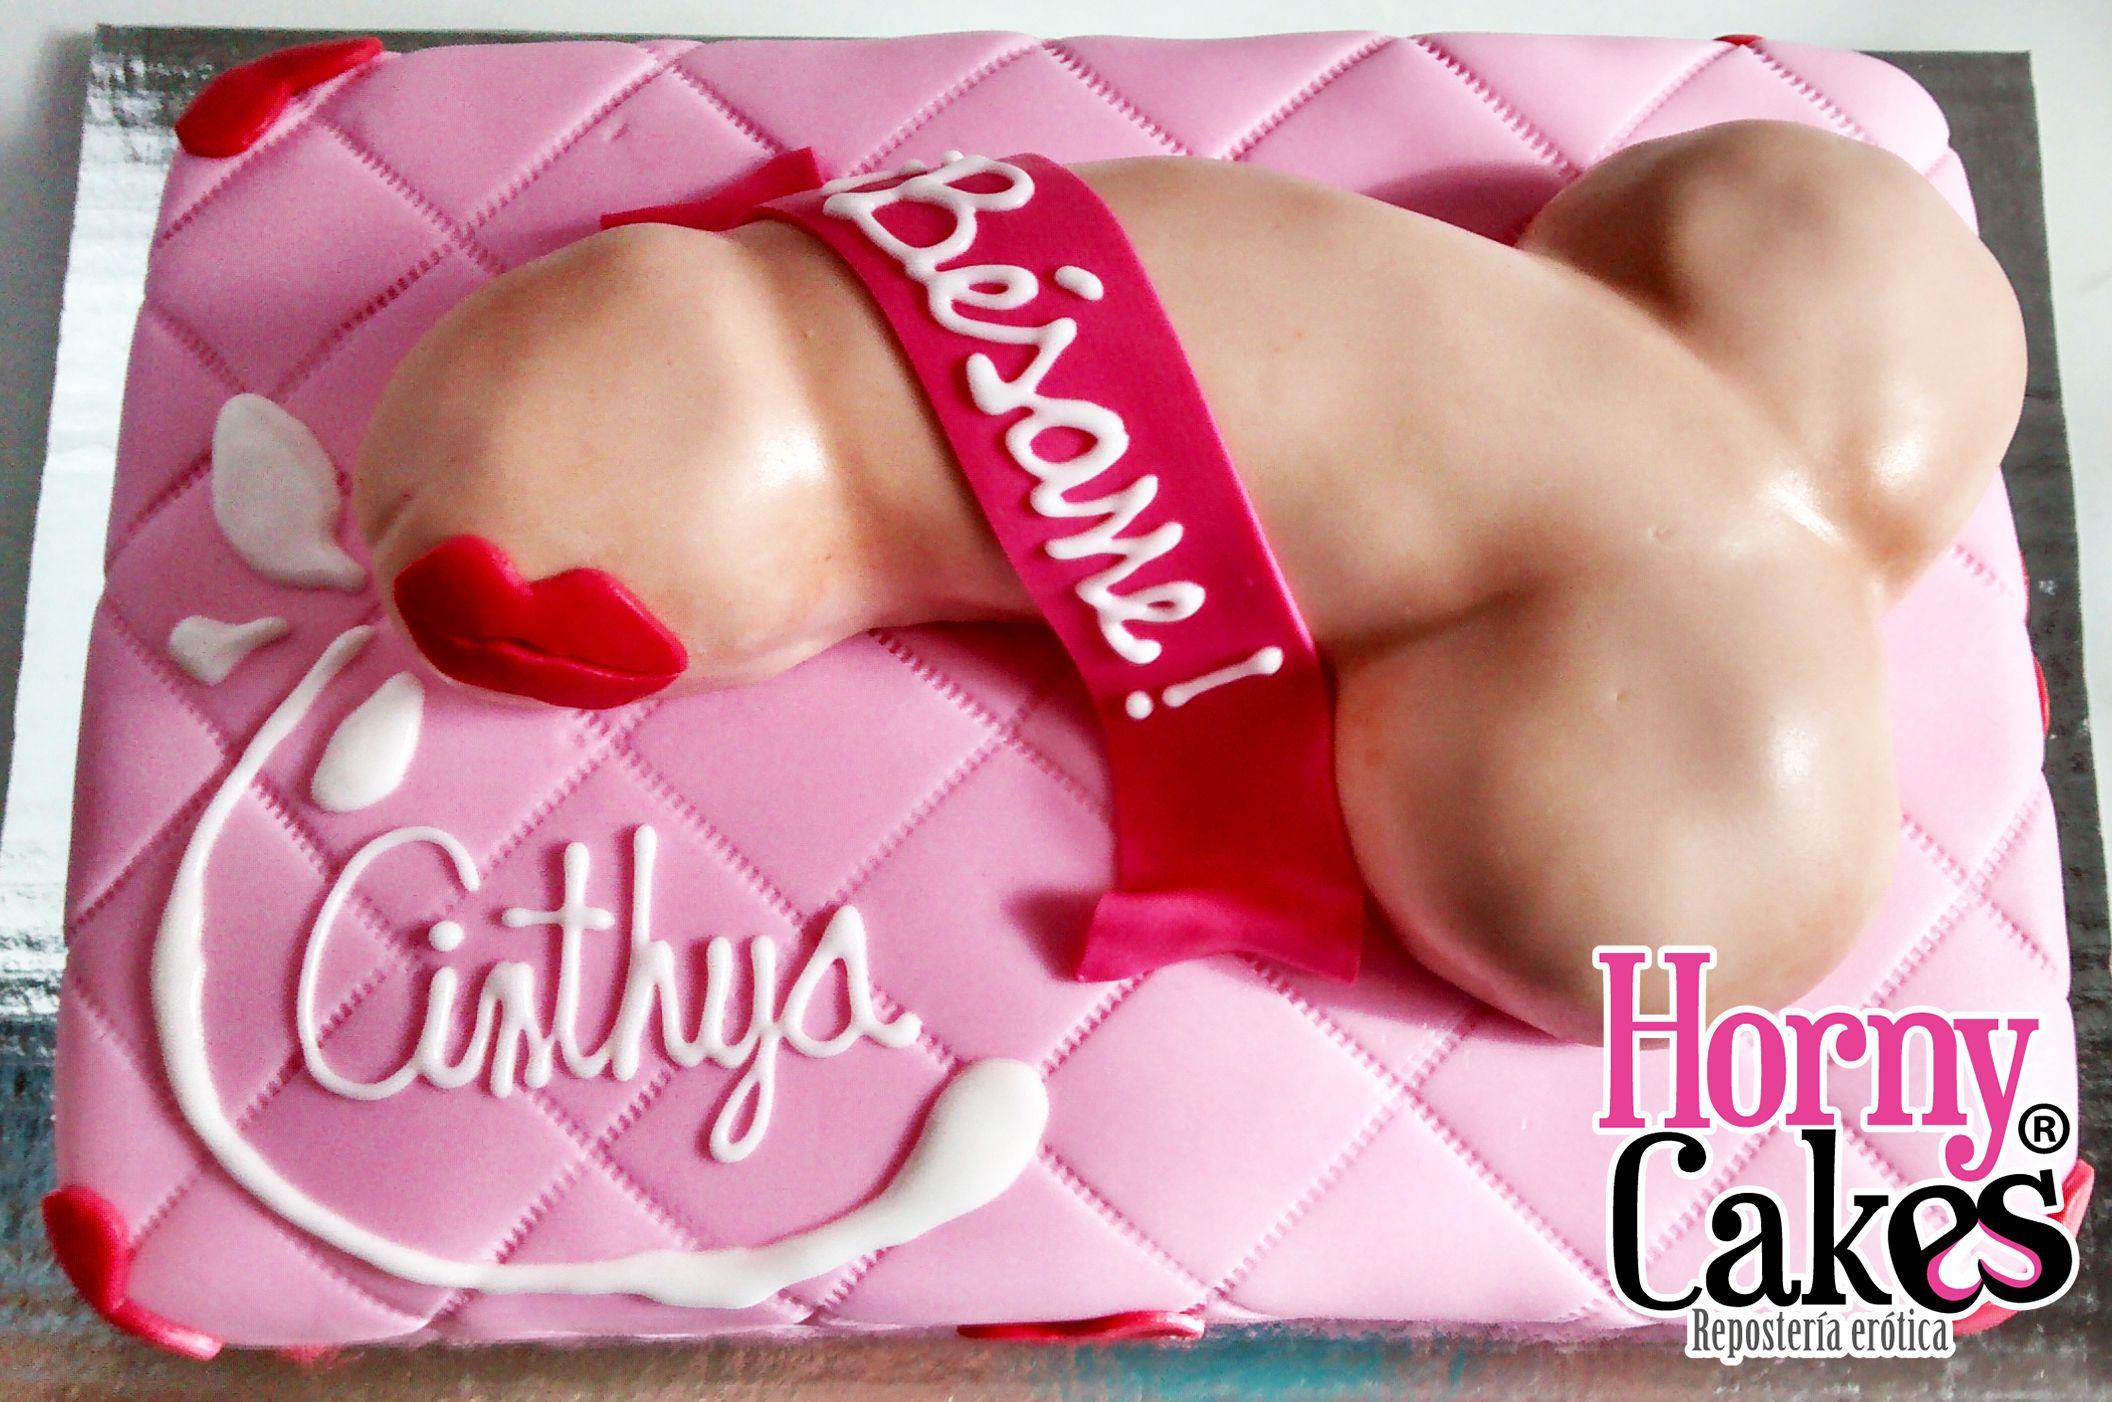 Fotos de pasteles para solteros